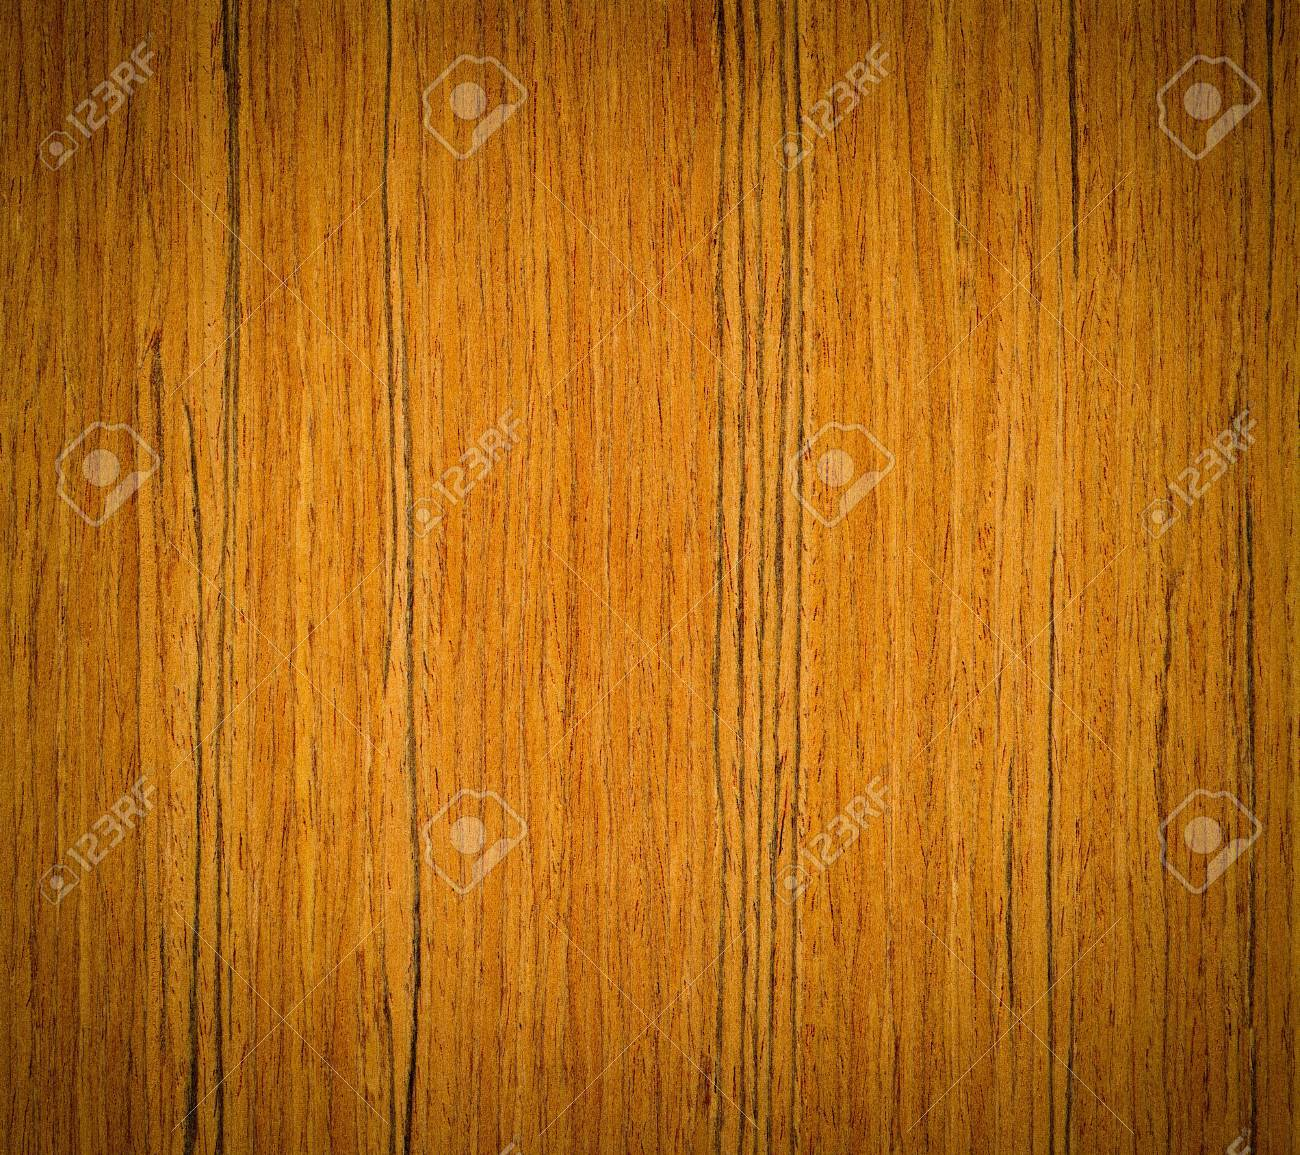 Wood Grain Texture Teak Wood